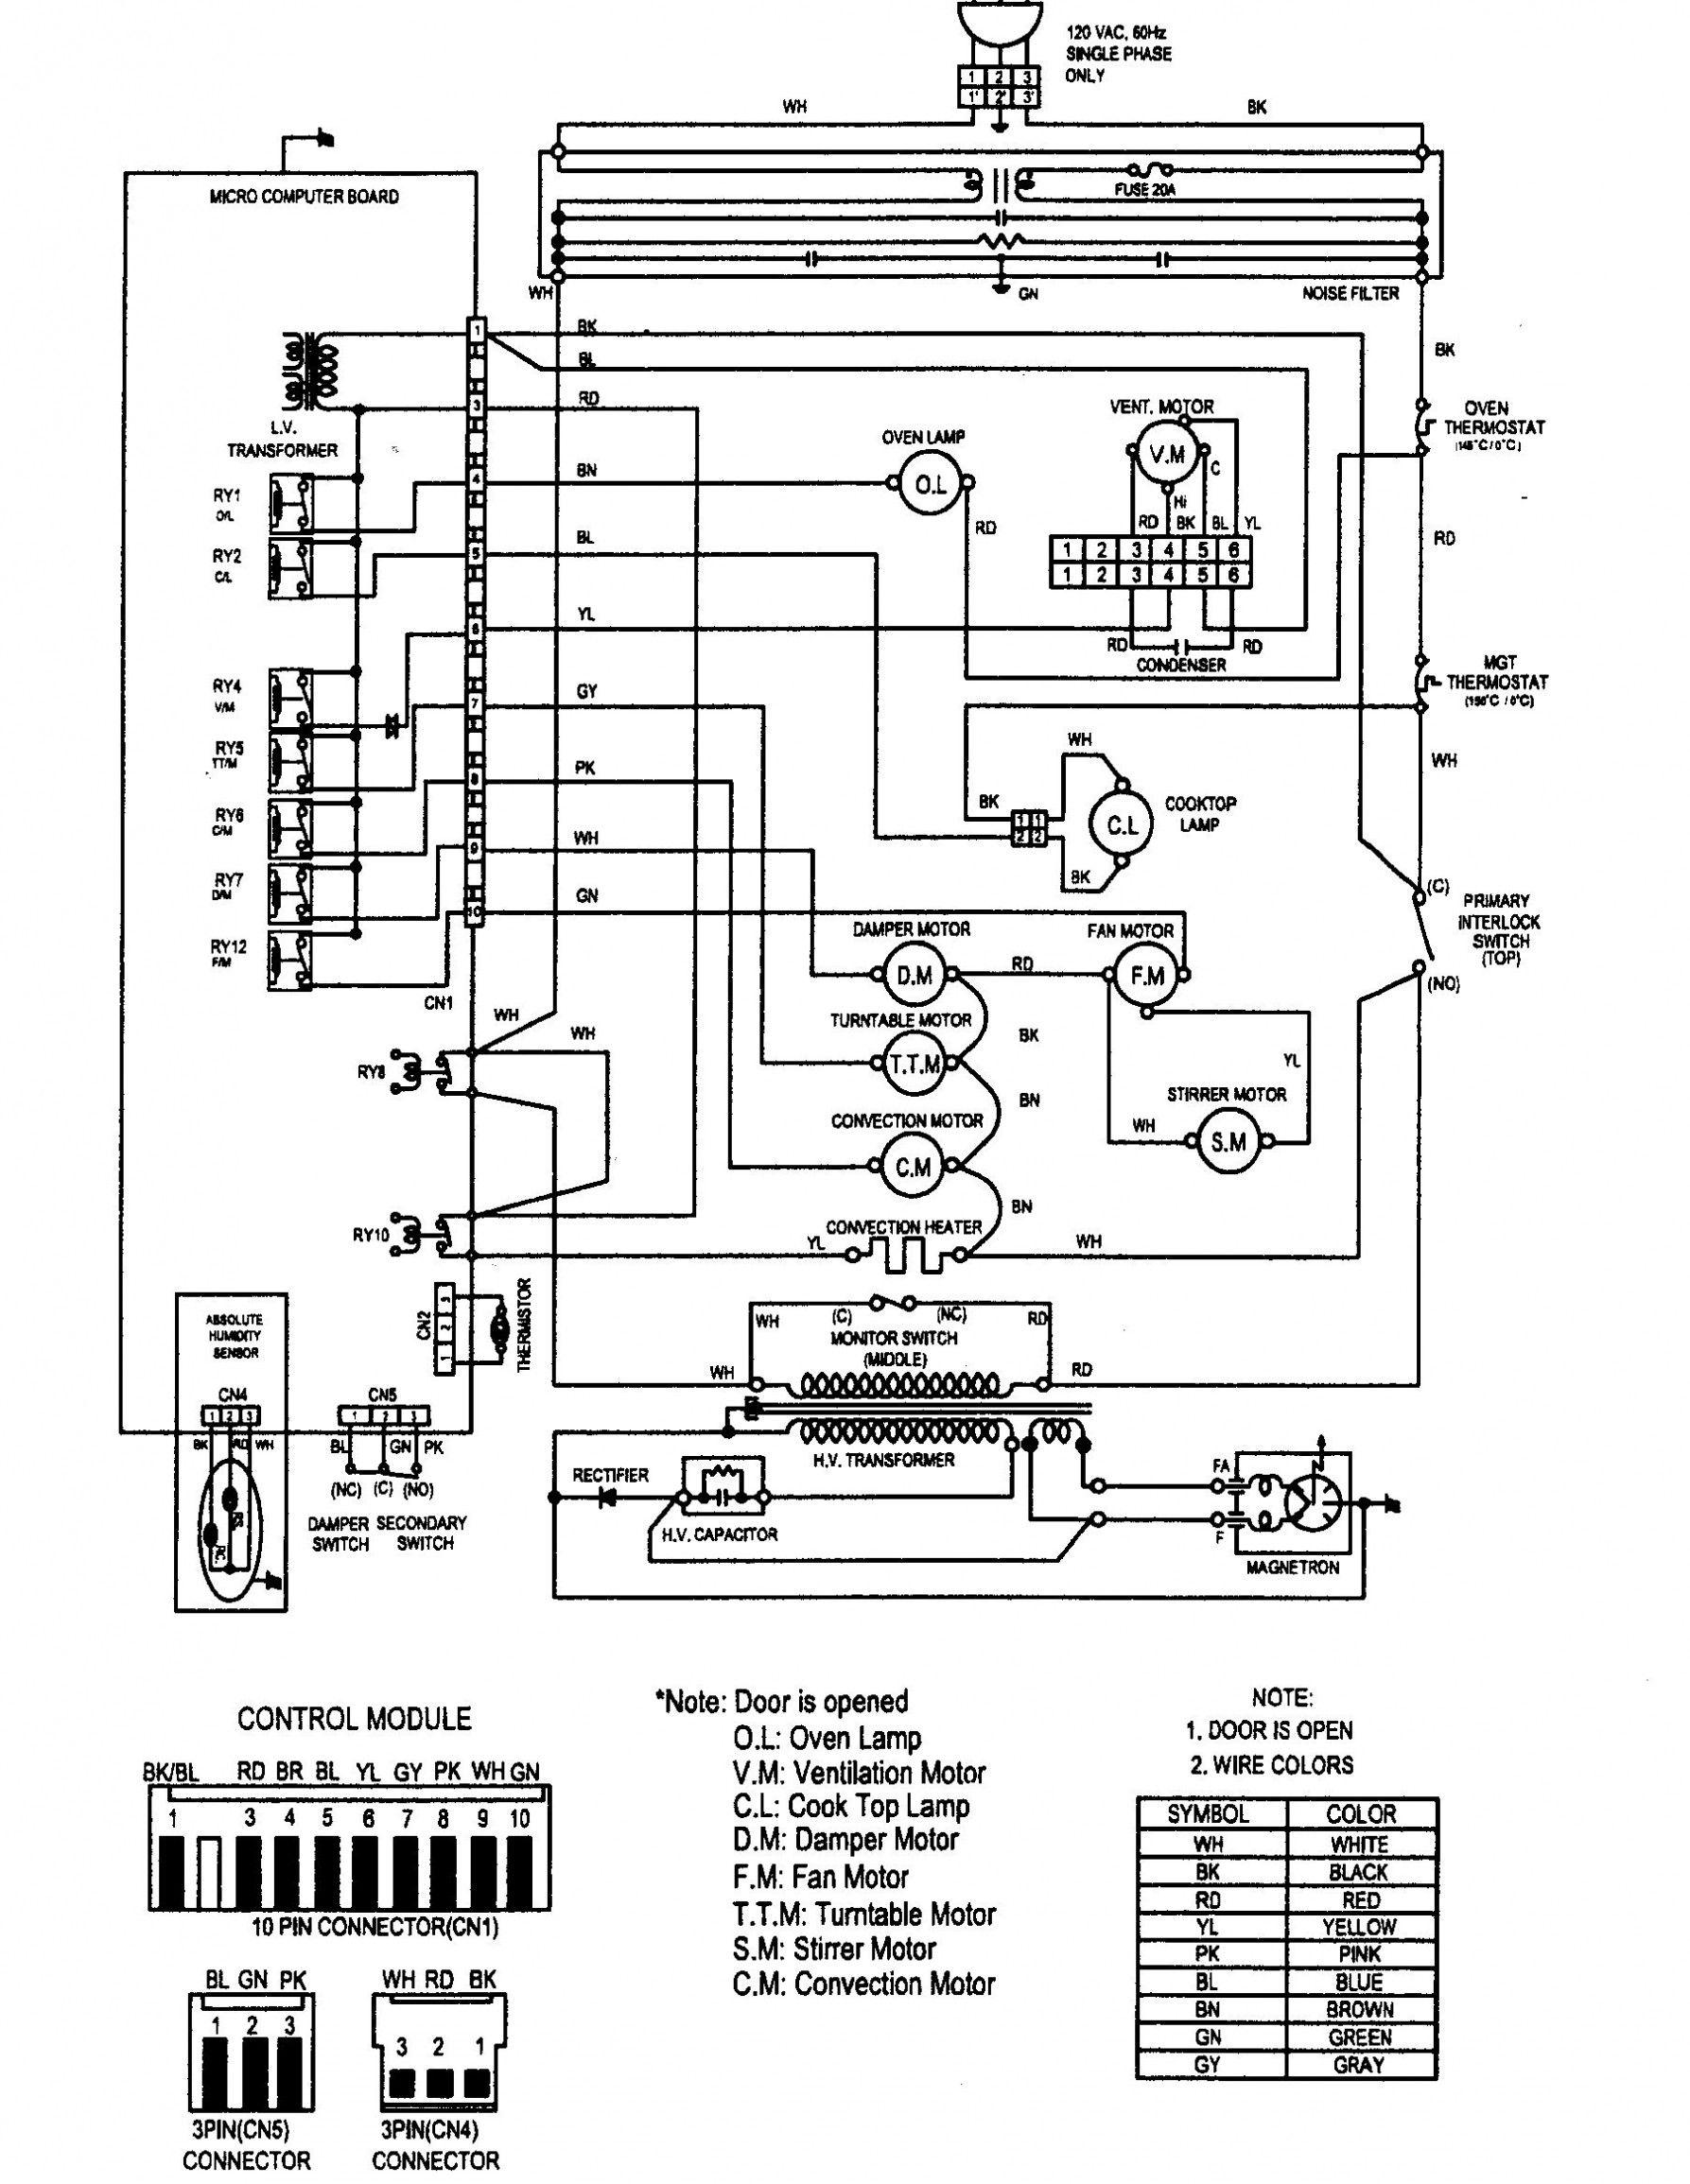 Unique Bosch Dishwasher Motor Wiring Diagram Diagram